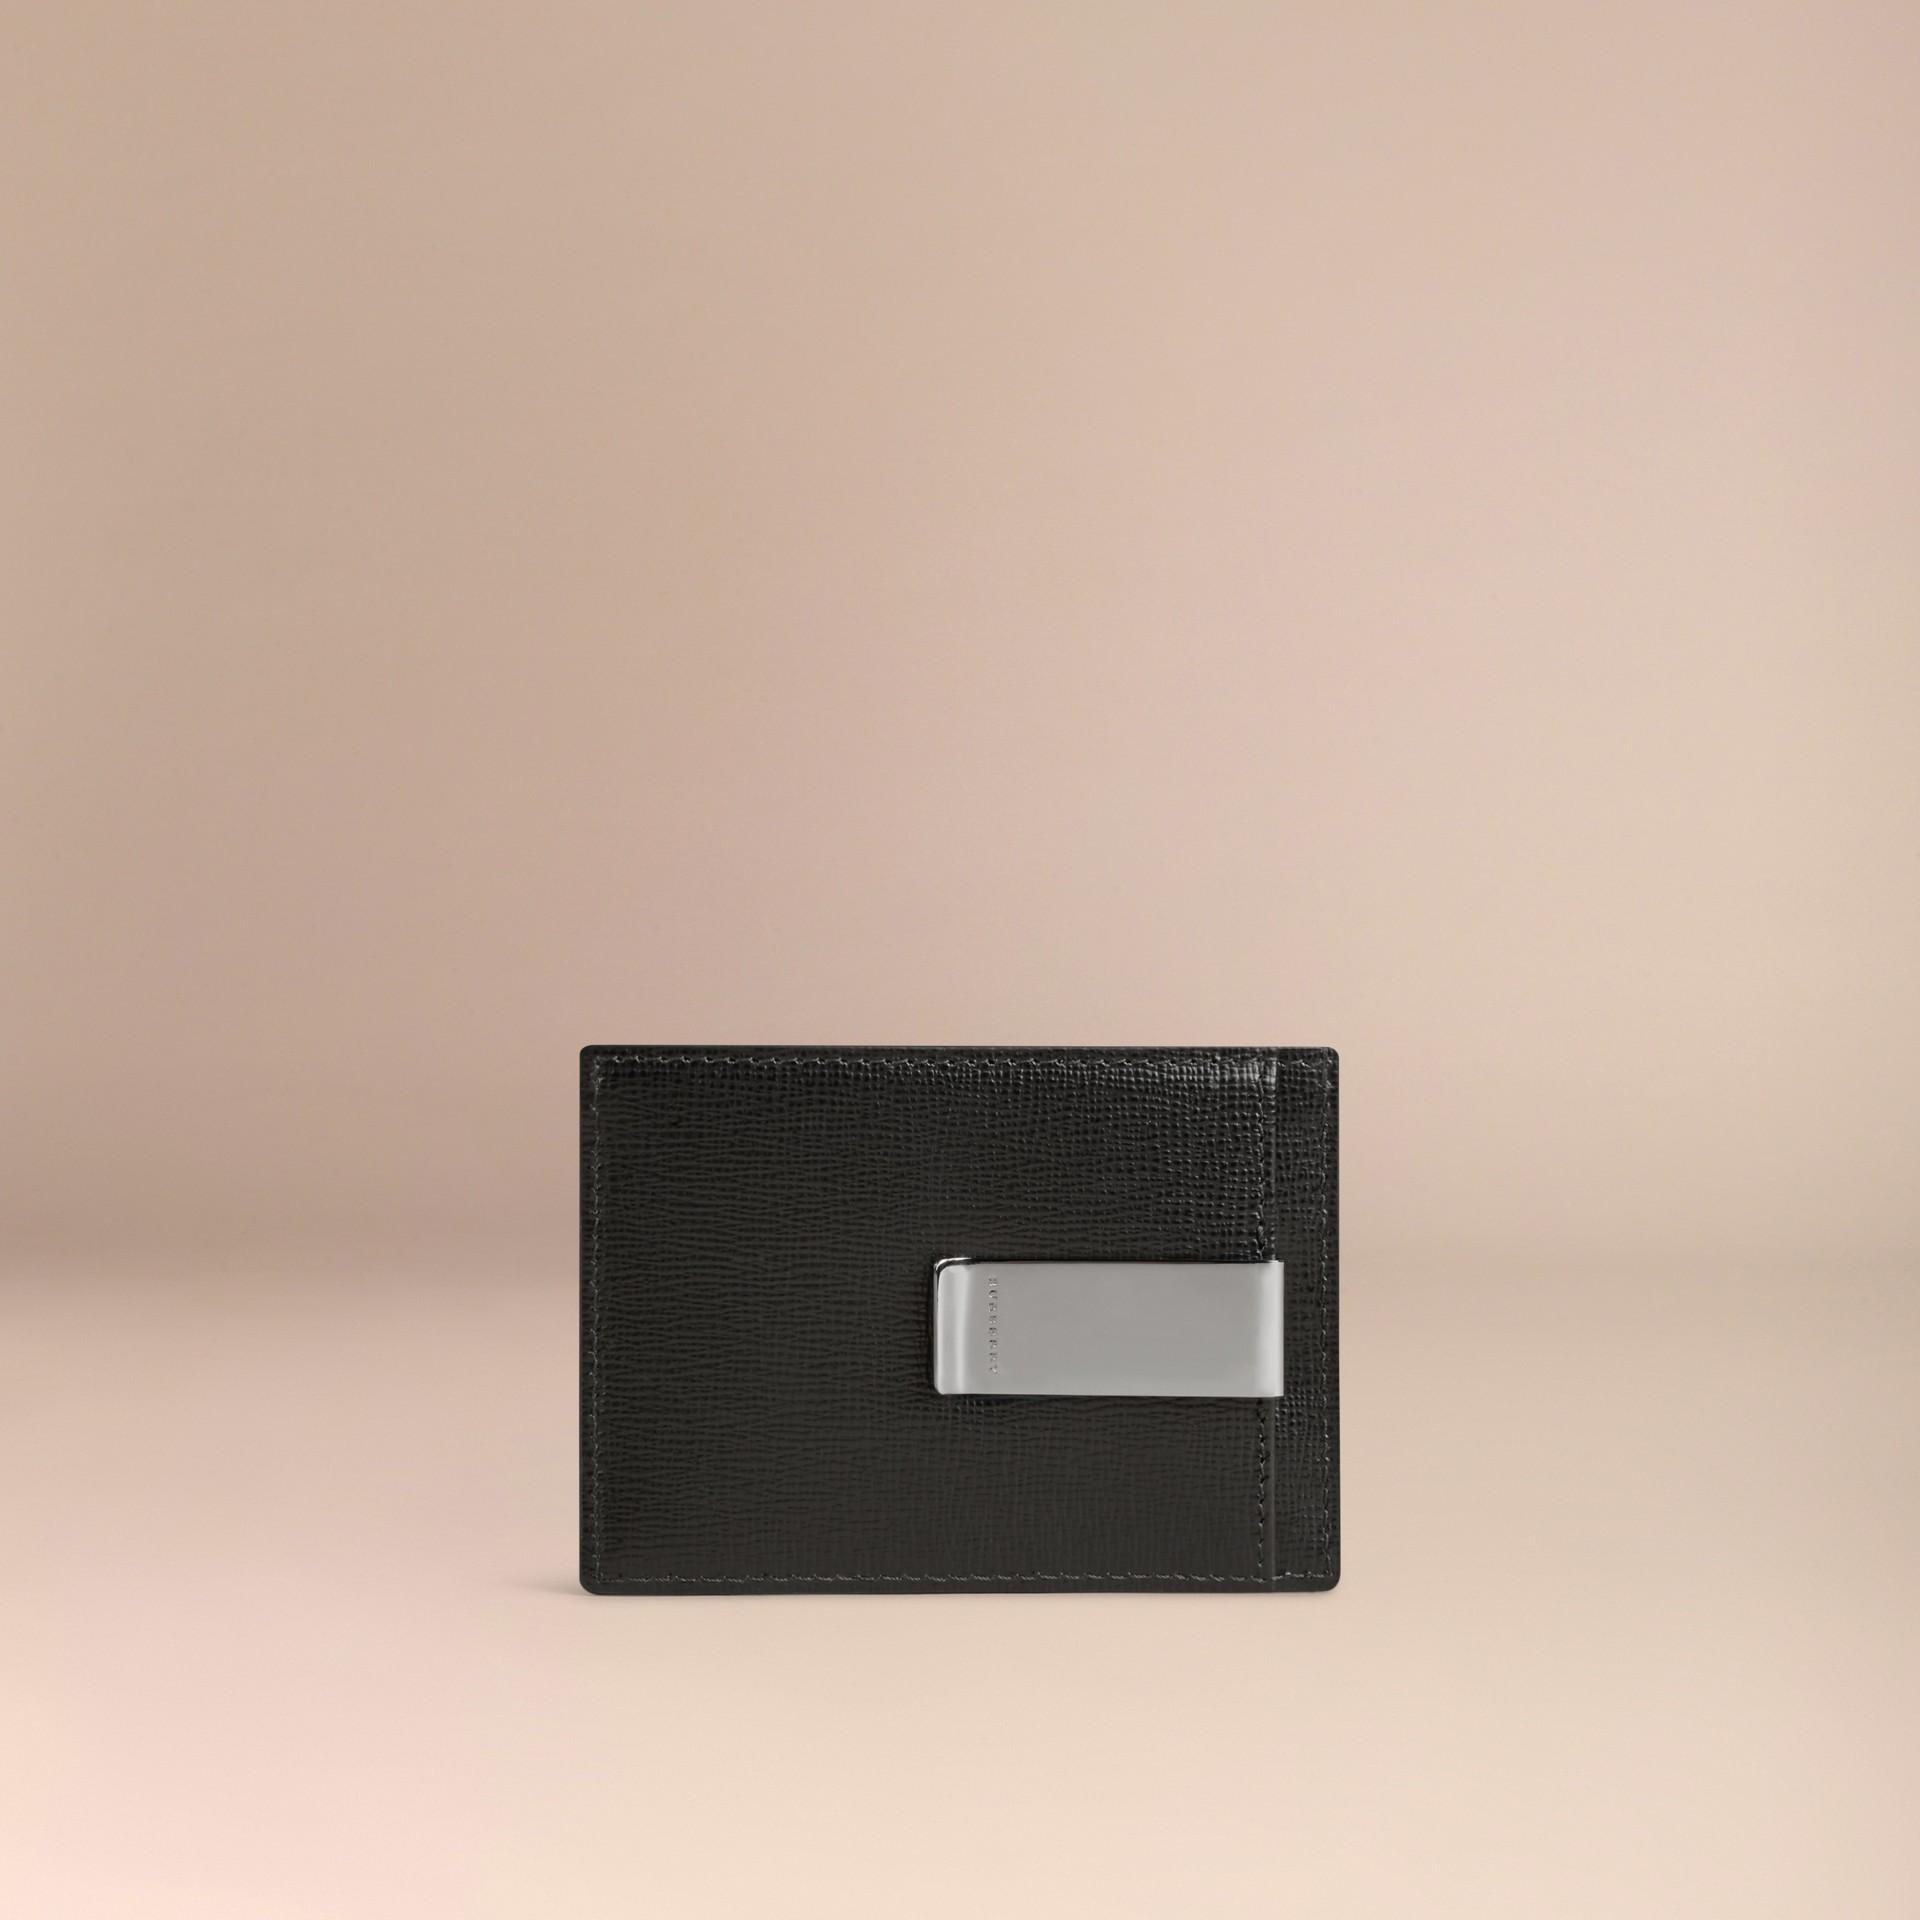 Black London Leather Money Clip Card Case Black - gallery image 2